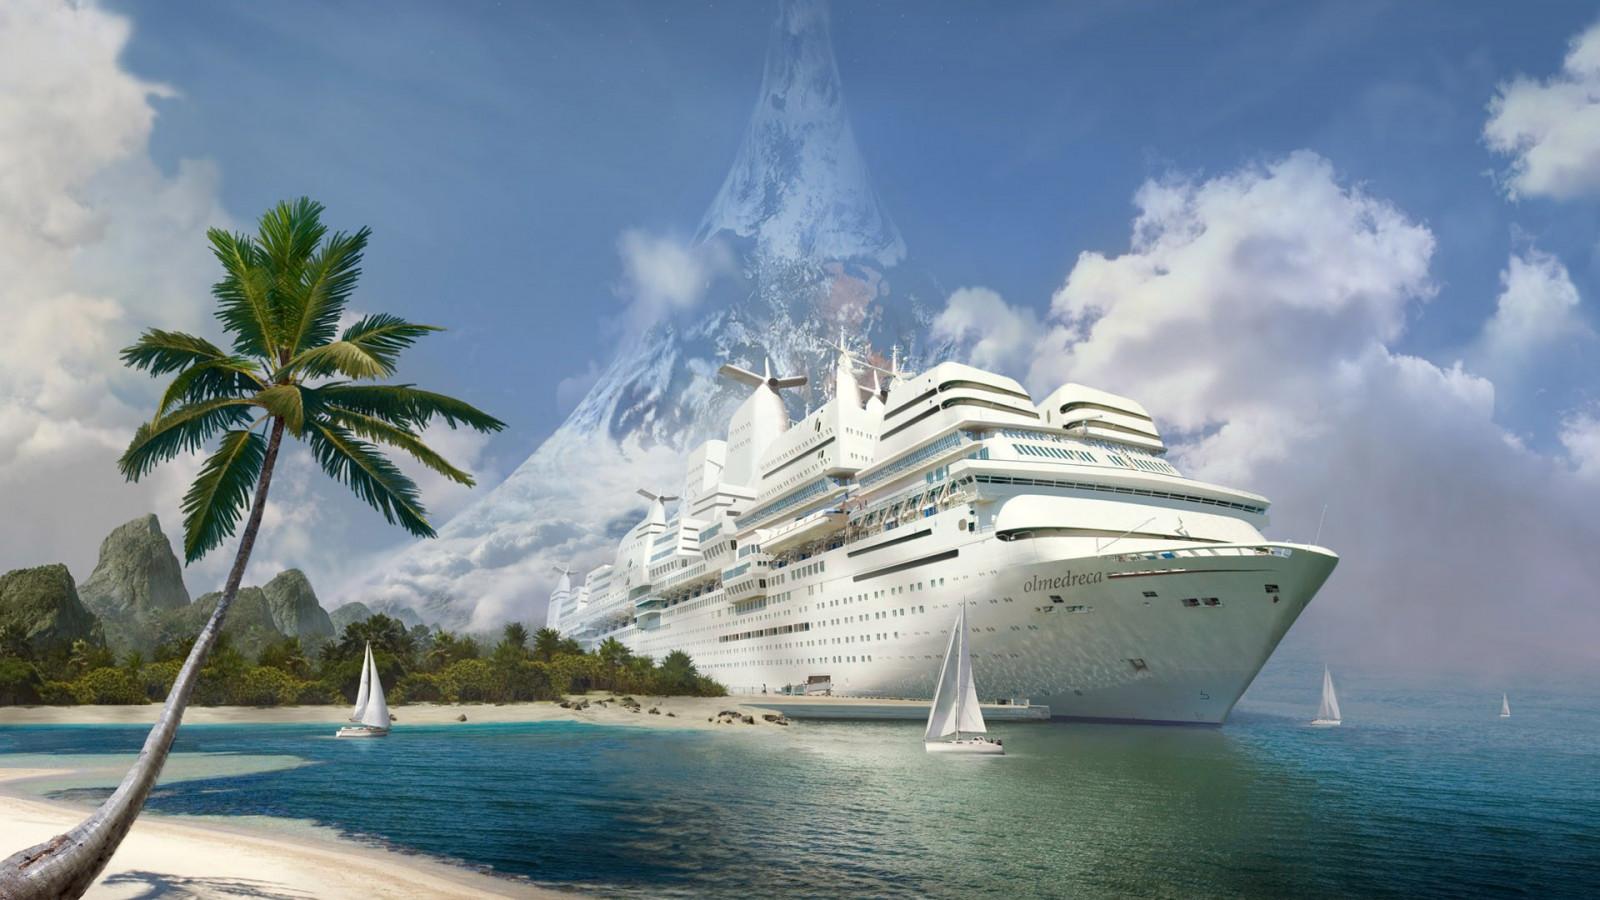 Wallpaper Perahu Teluk Kendaraan Pantai Lingkaran